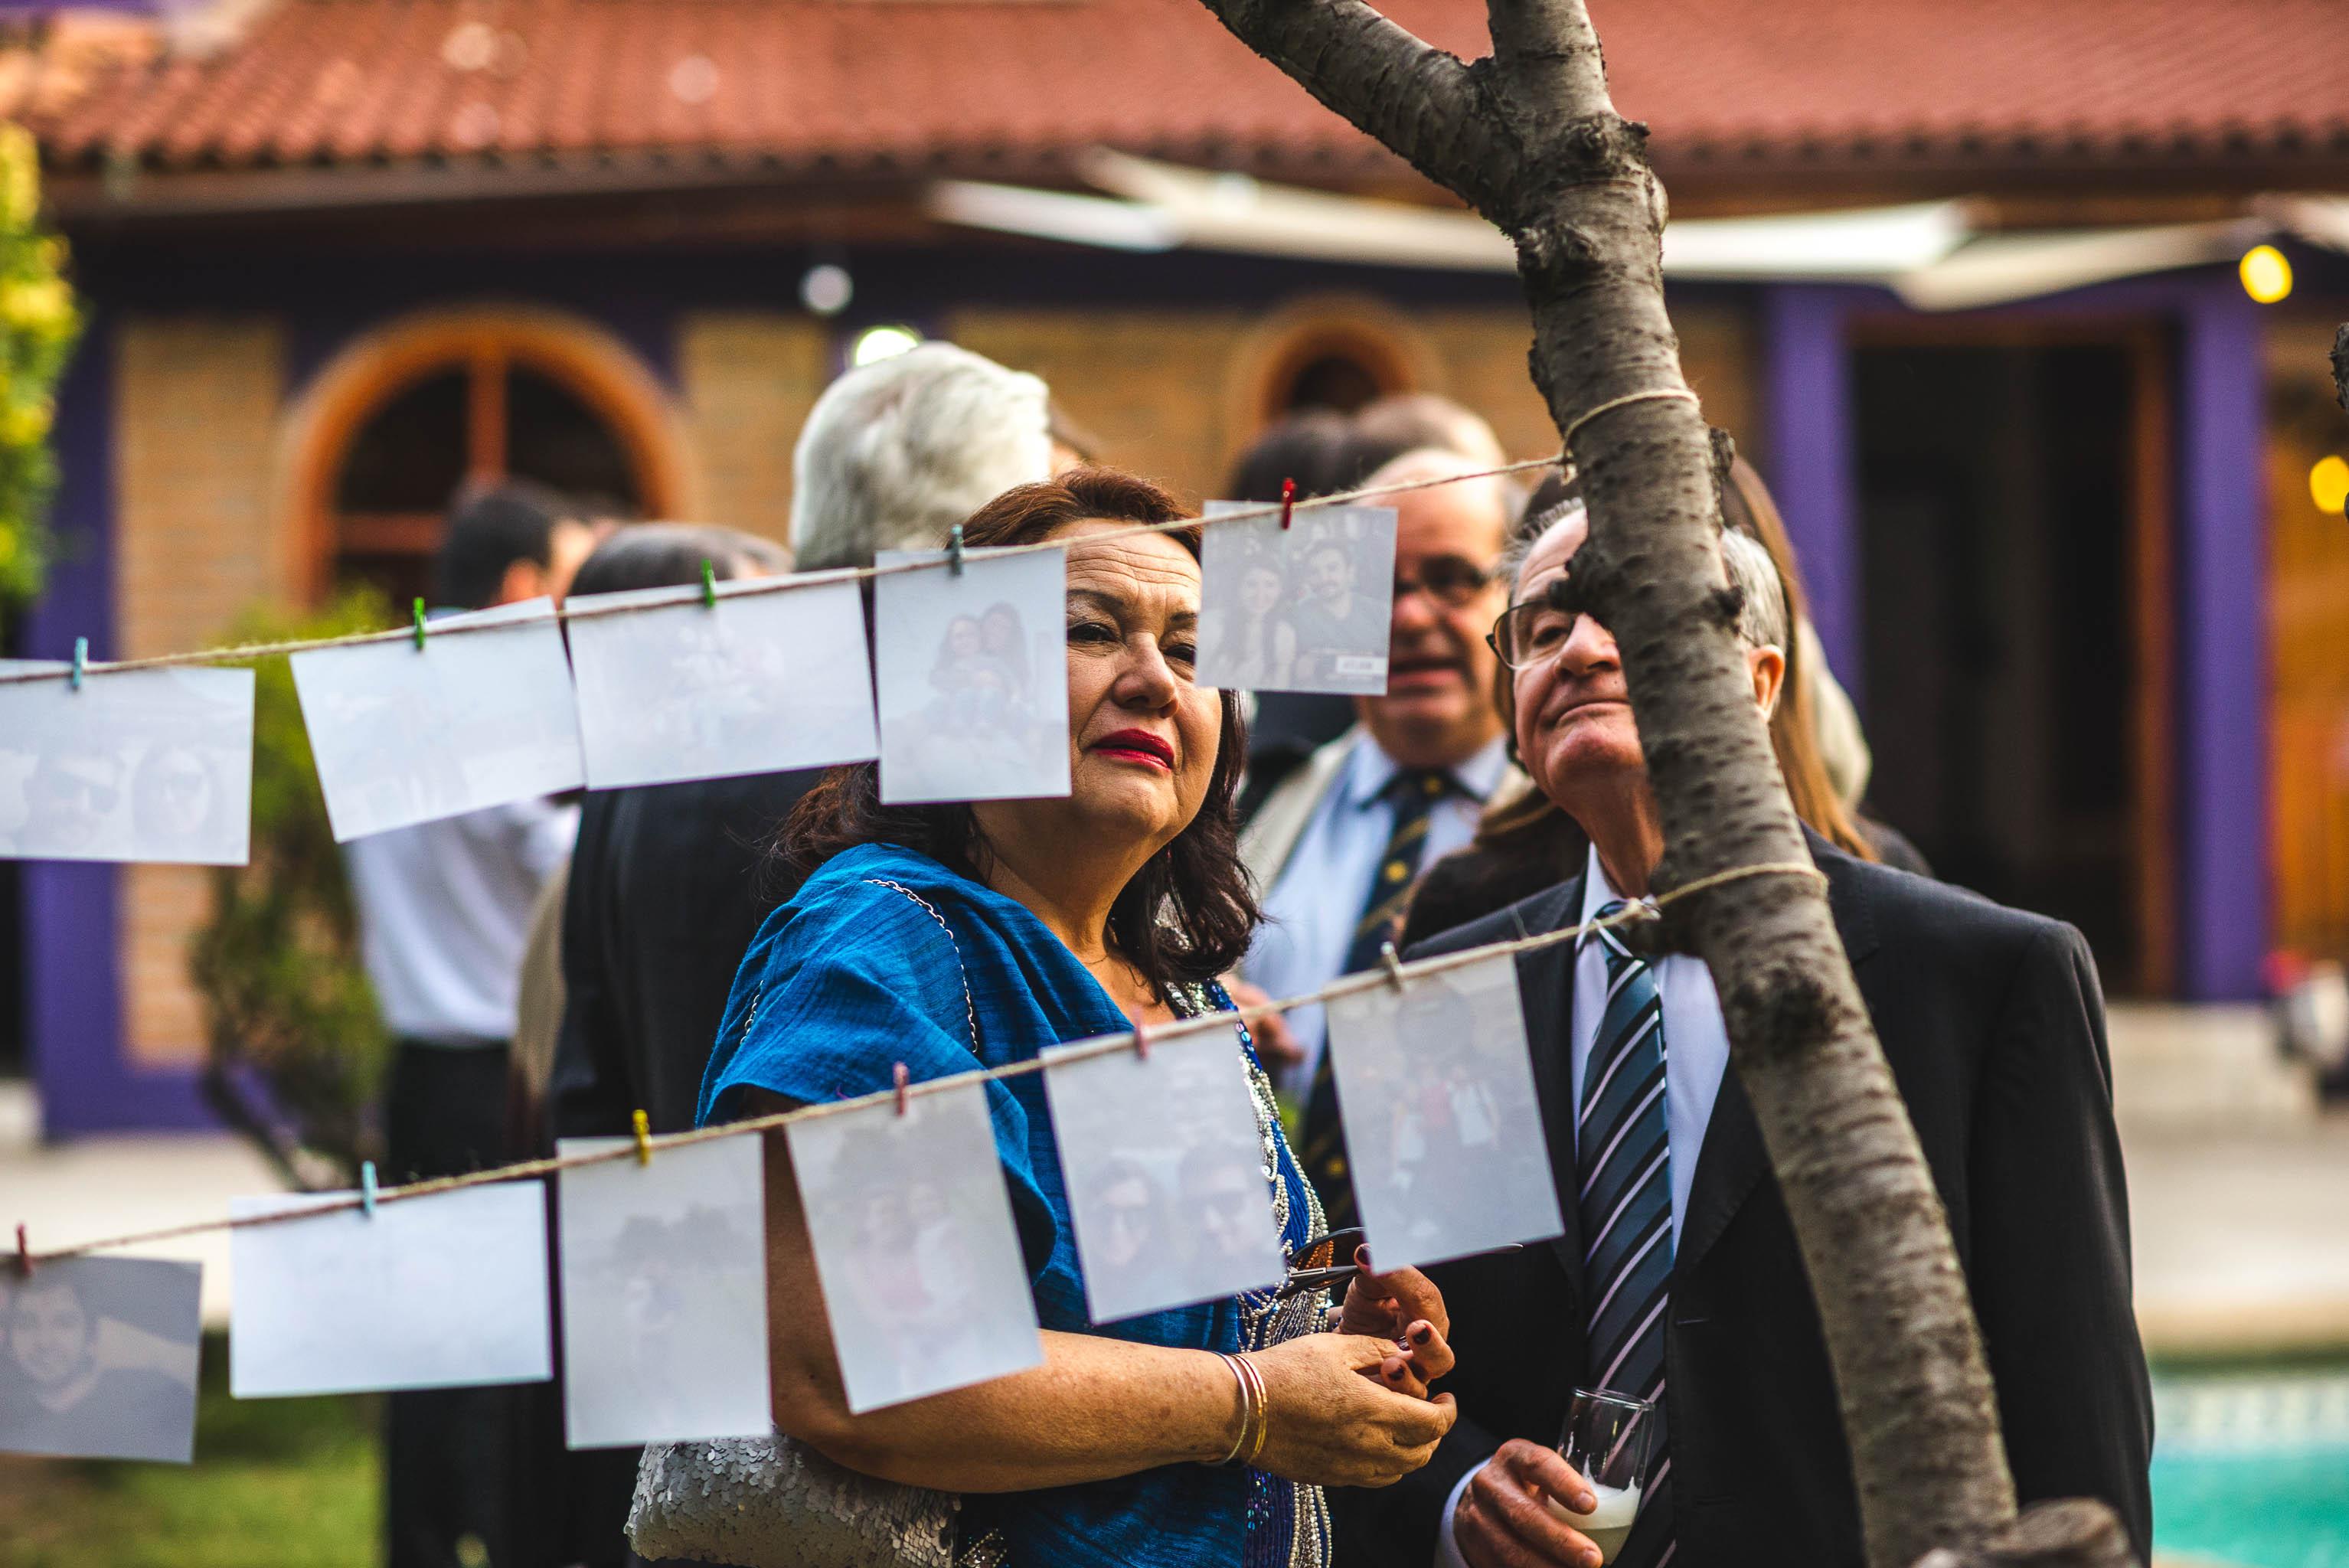 fotografo documental de matrimonios-fotografo matrimonio santiago-ceremonia